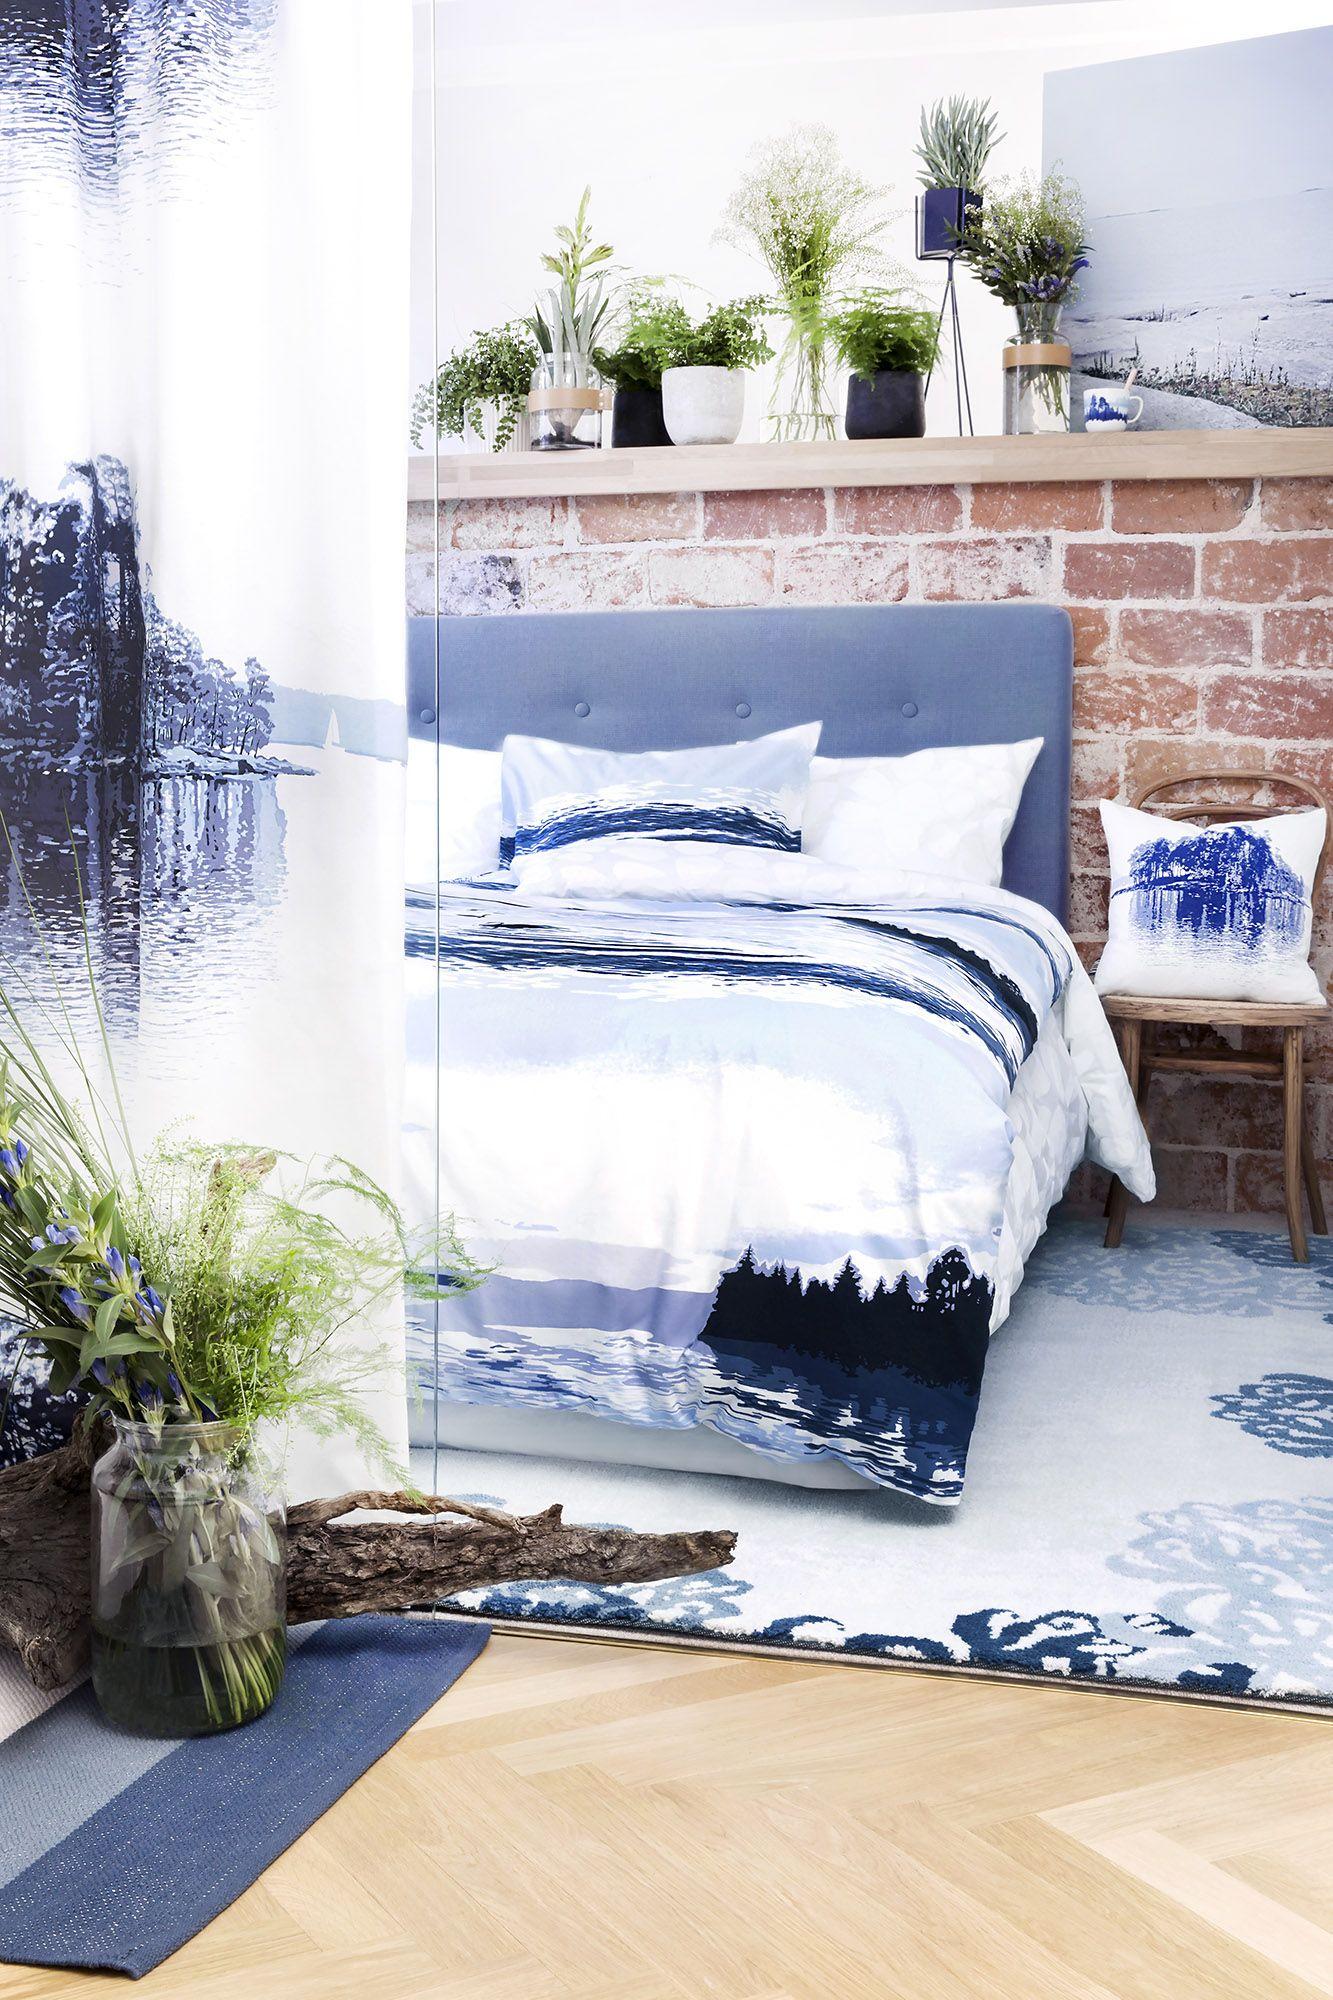 Lapintaika bed set and Merellä curtain and cushion by Riina Kuikka, Matilda rug Tanja Orsjoki